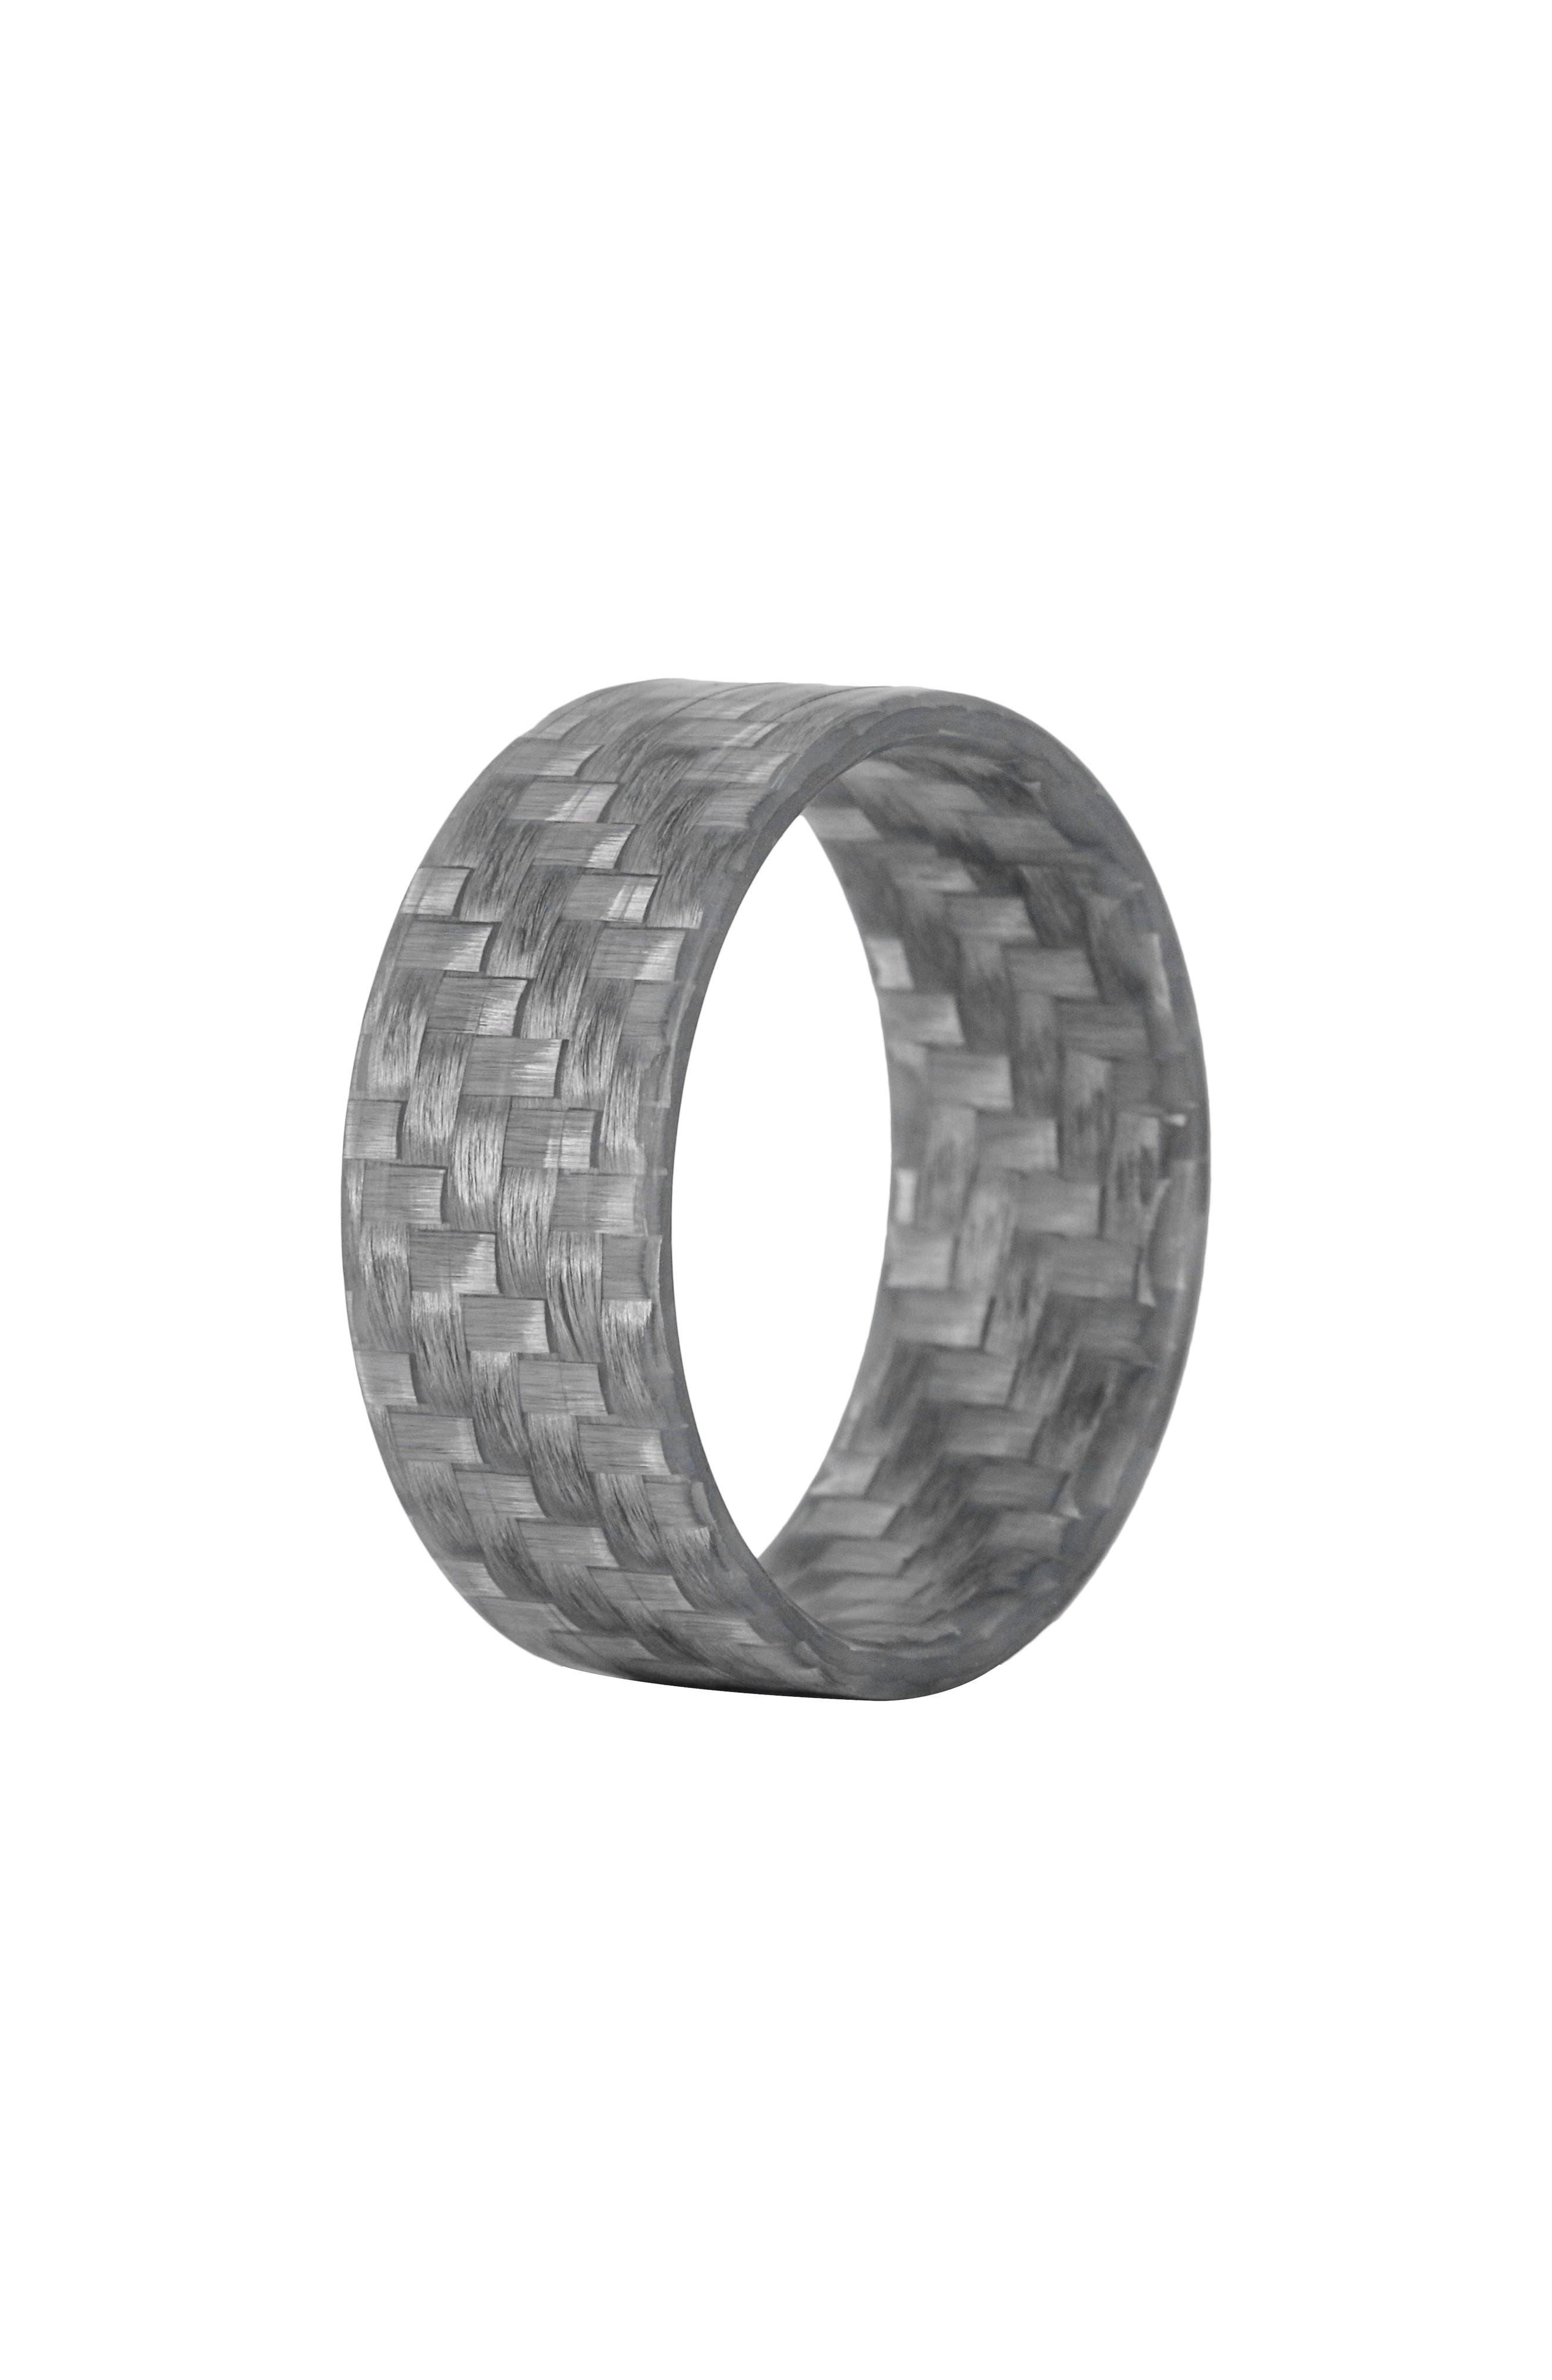 Ultralight Fiberglass Ring